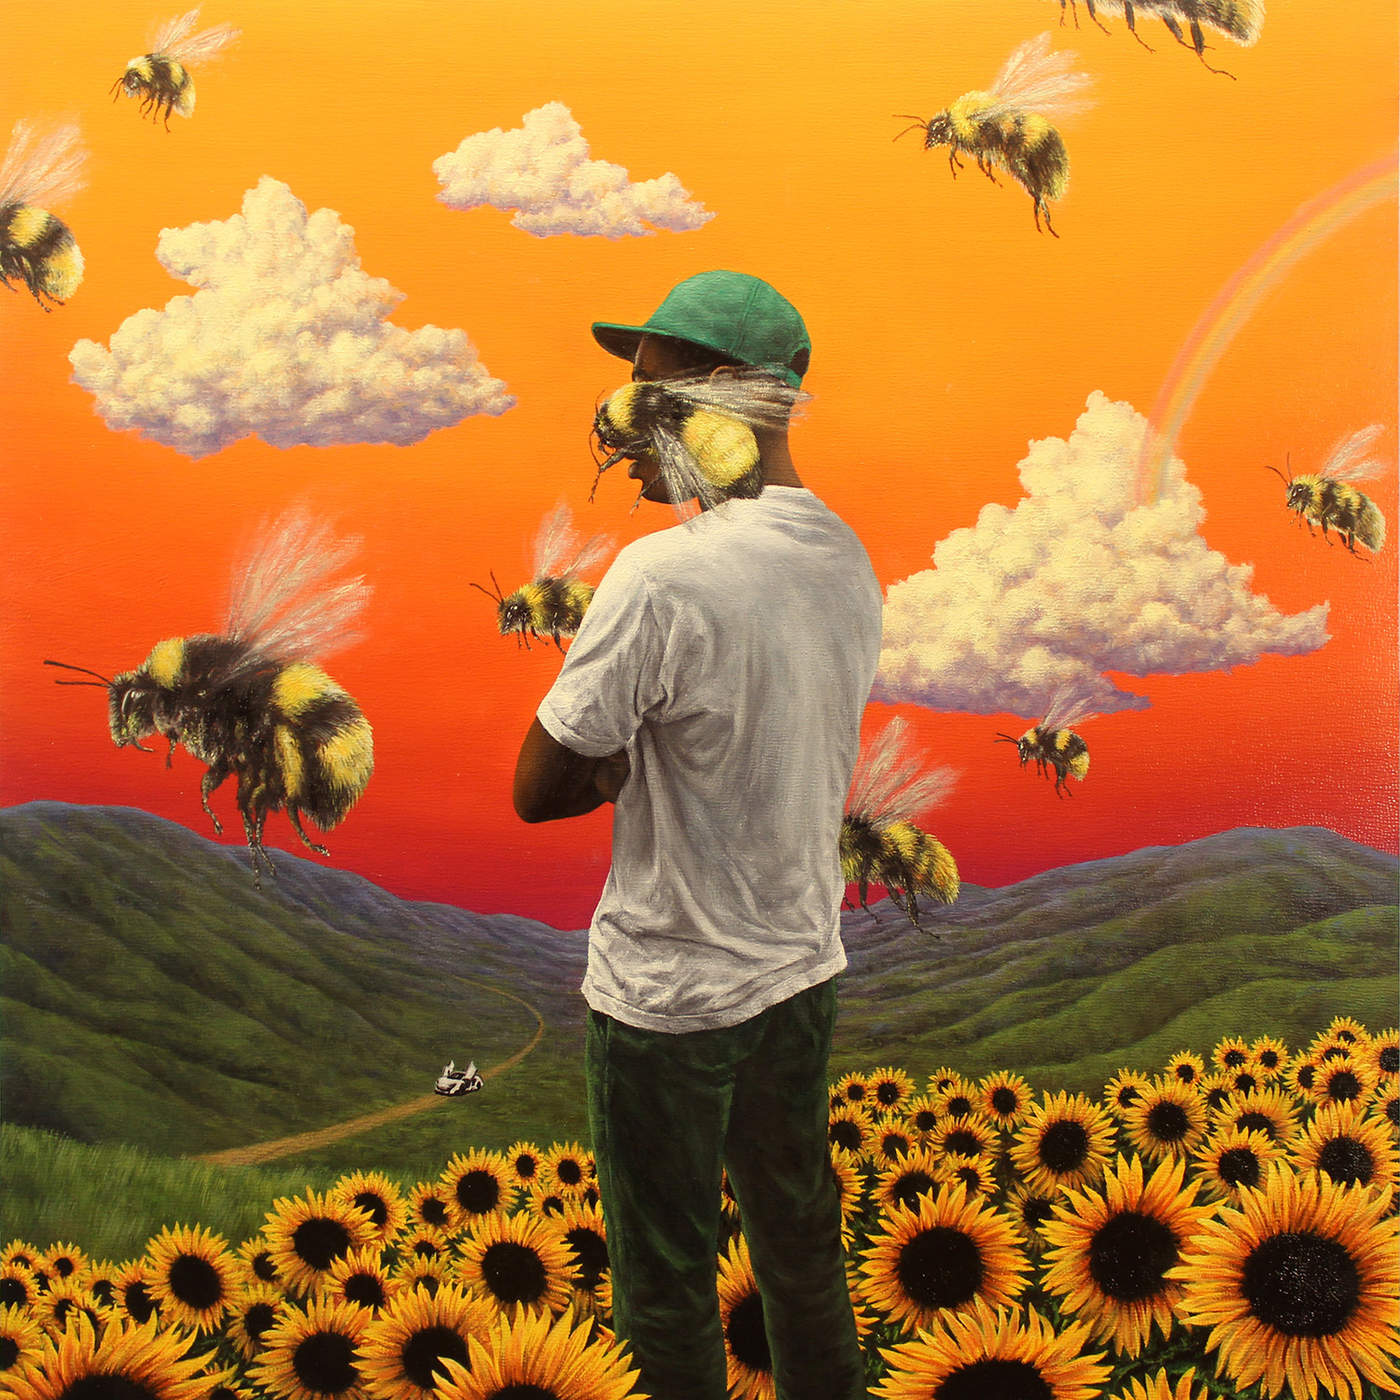 Tyler, the Creator - Boredom - Single Cover